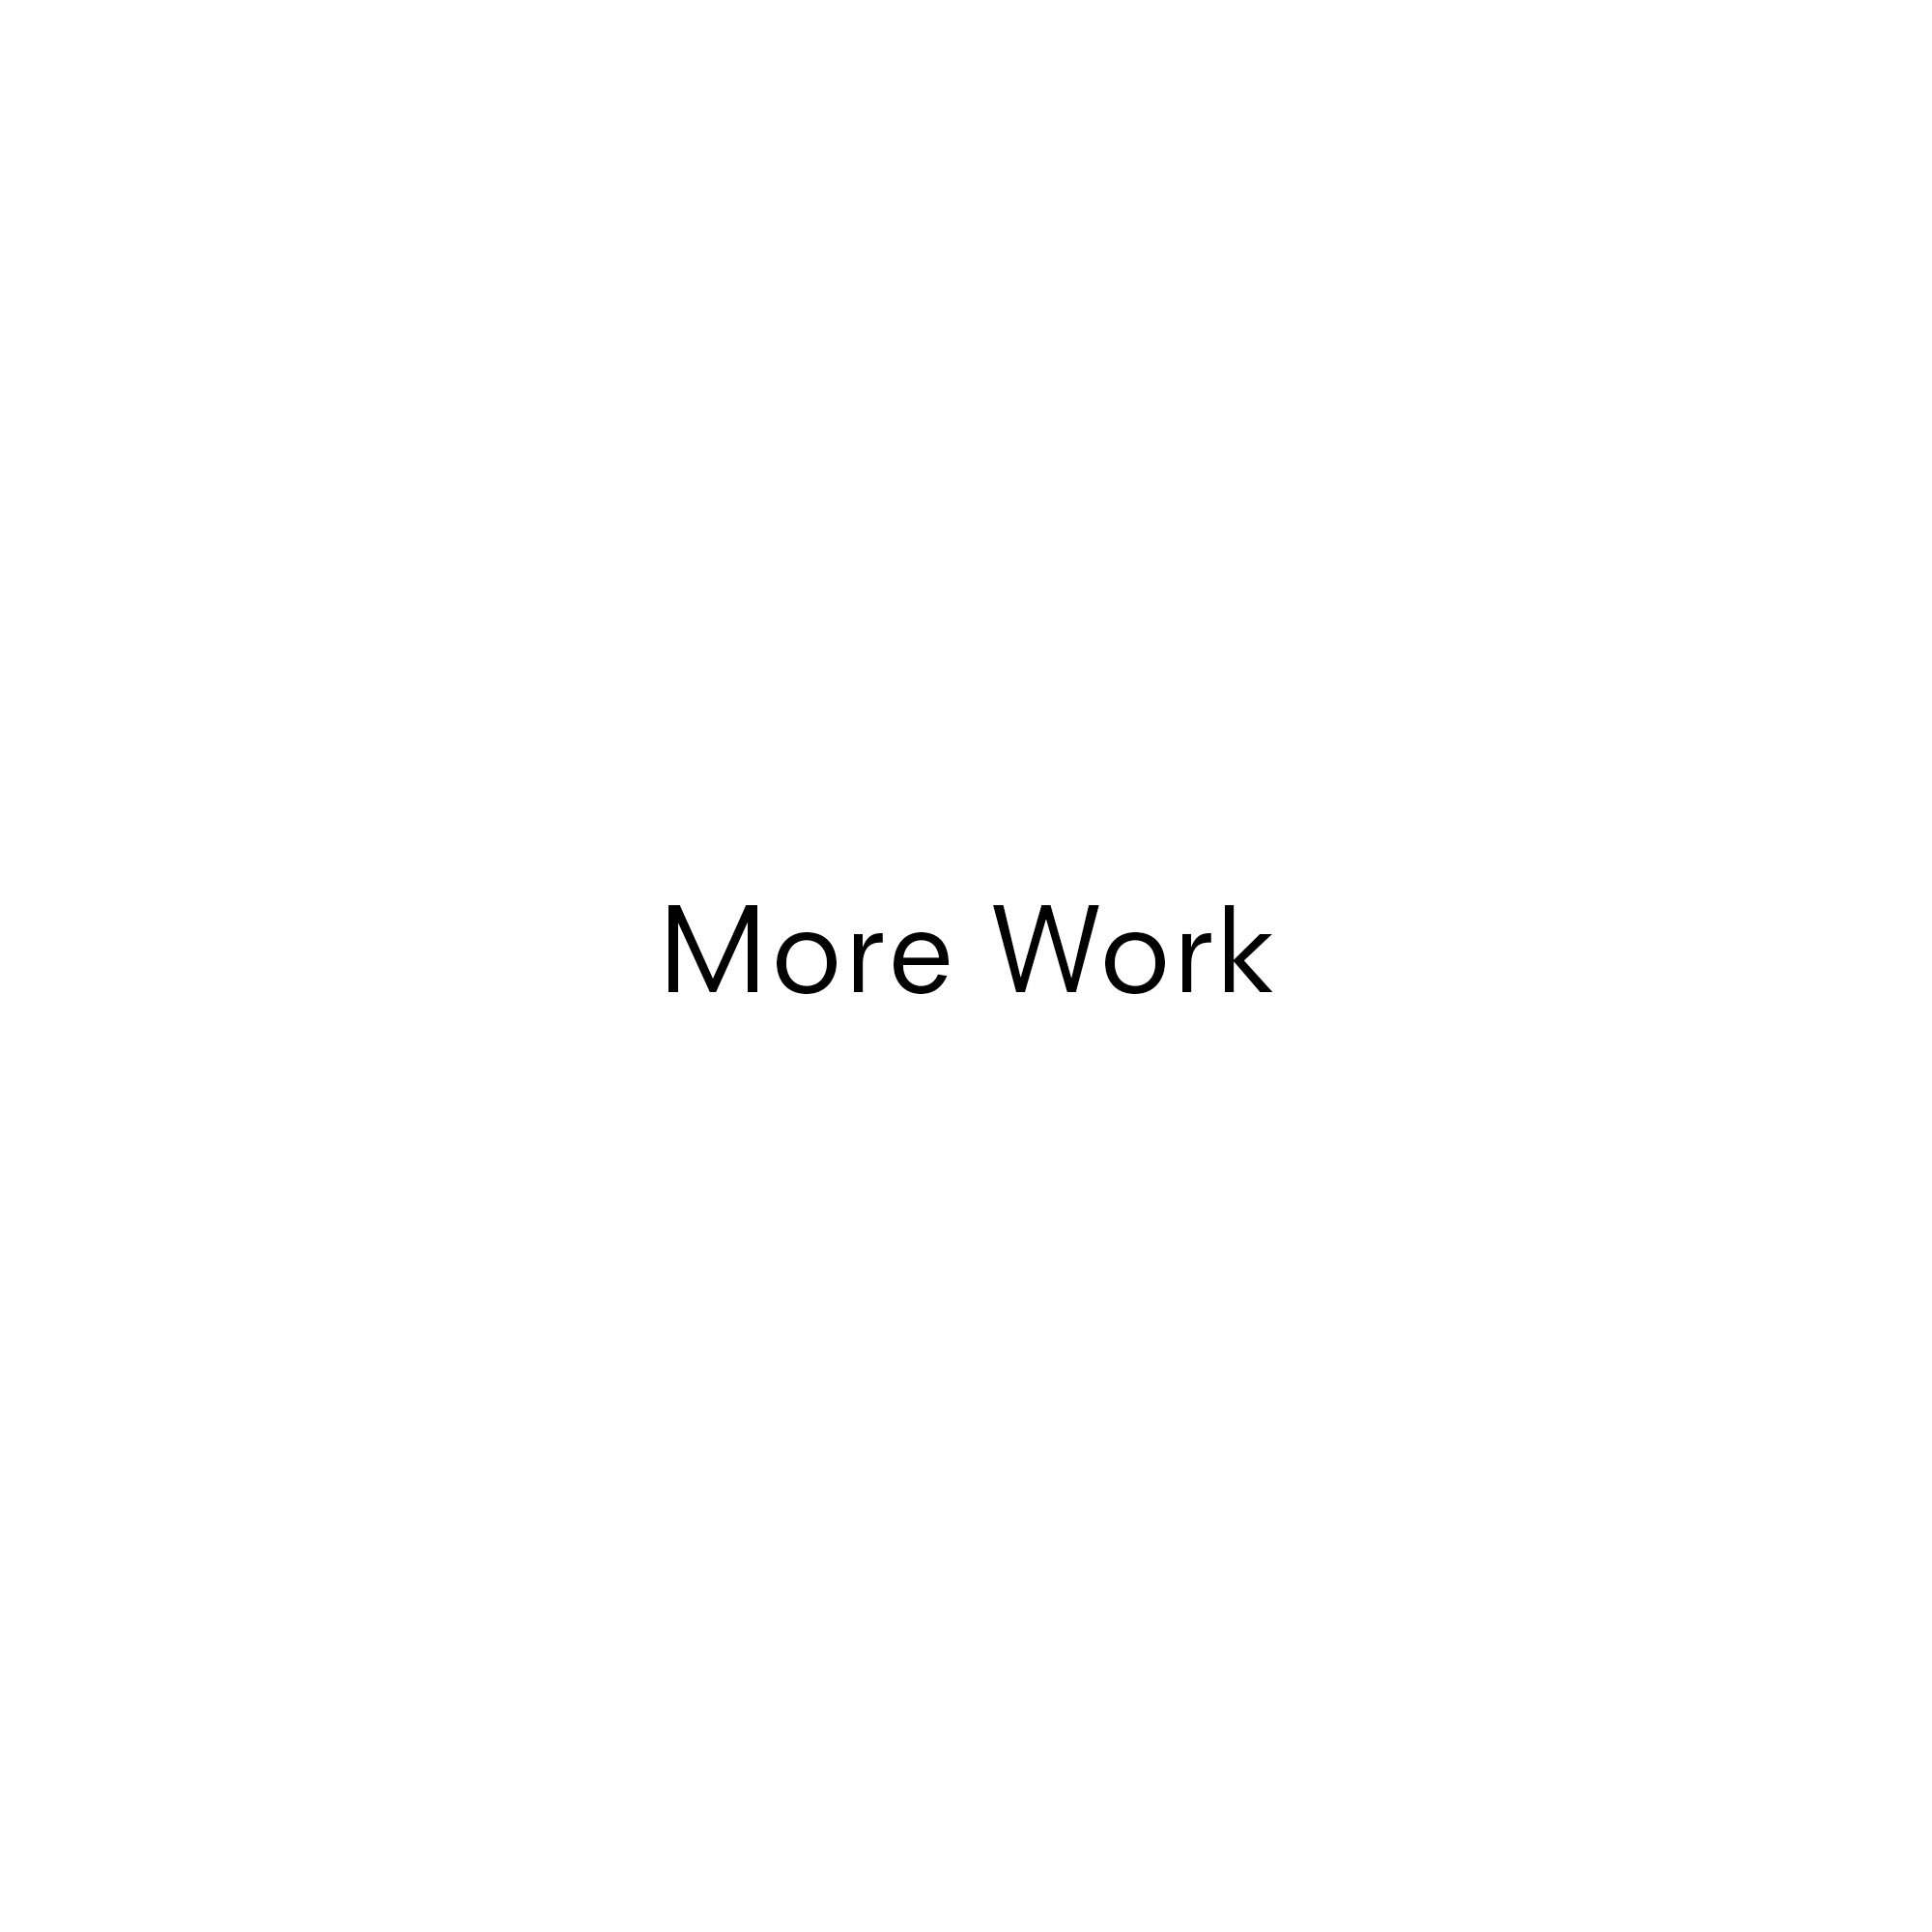 morework.jpg